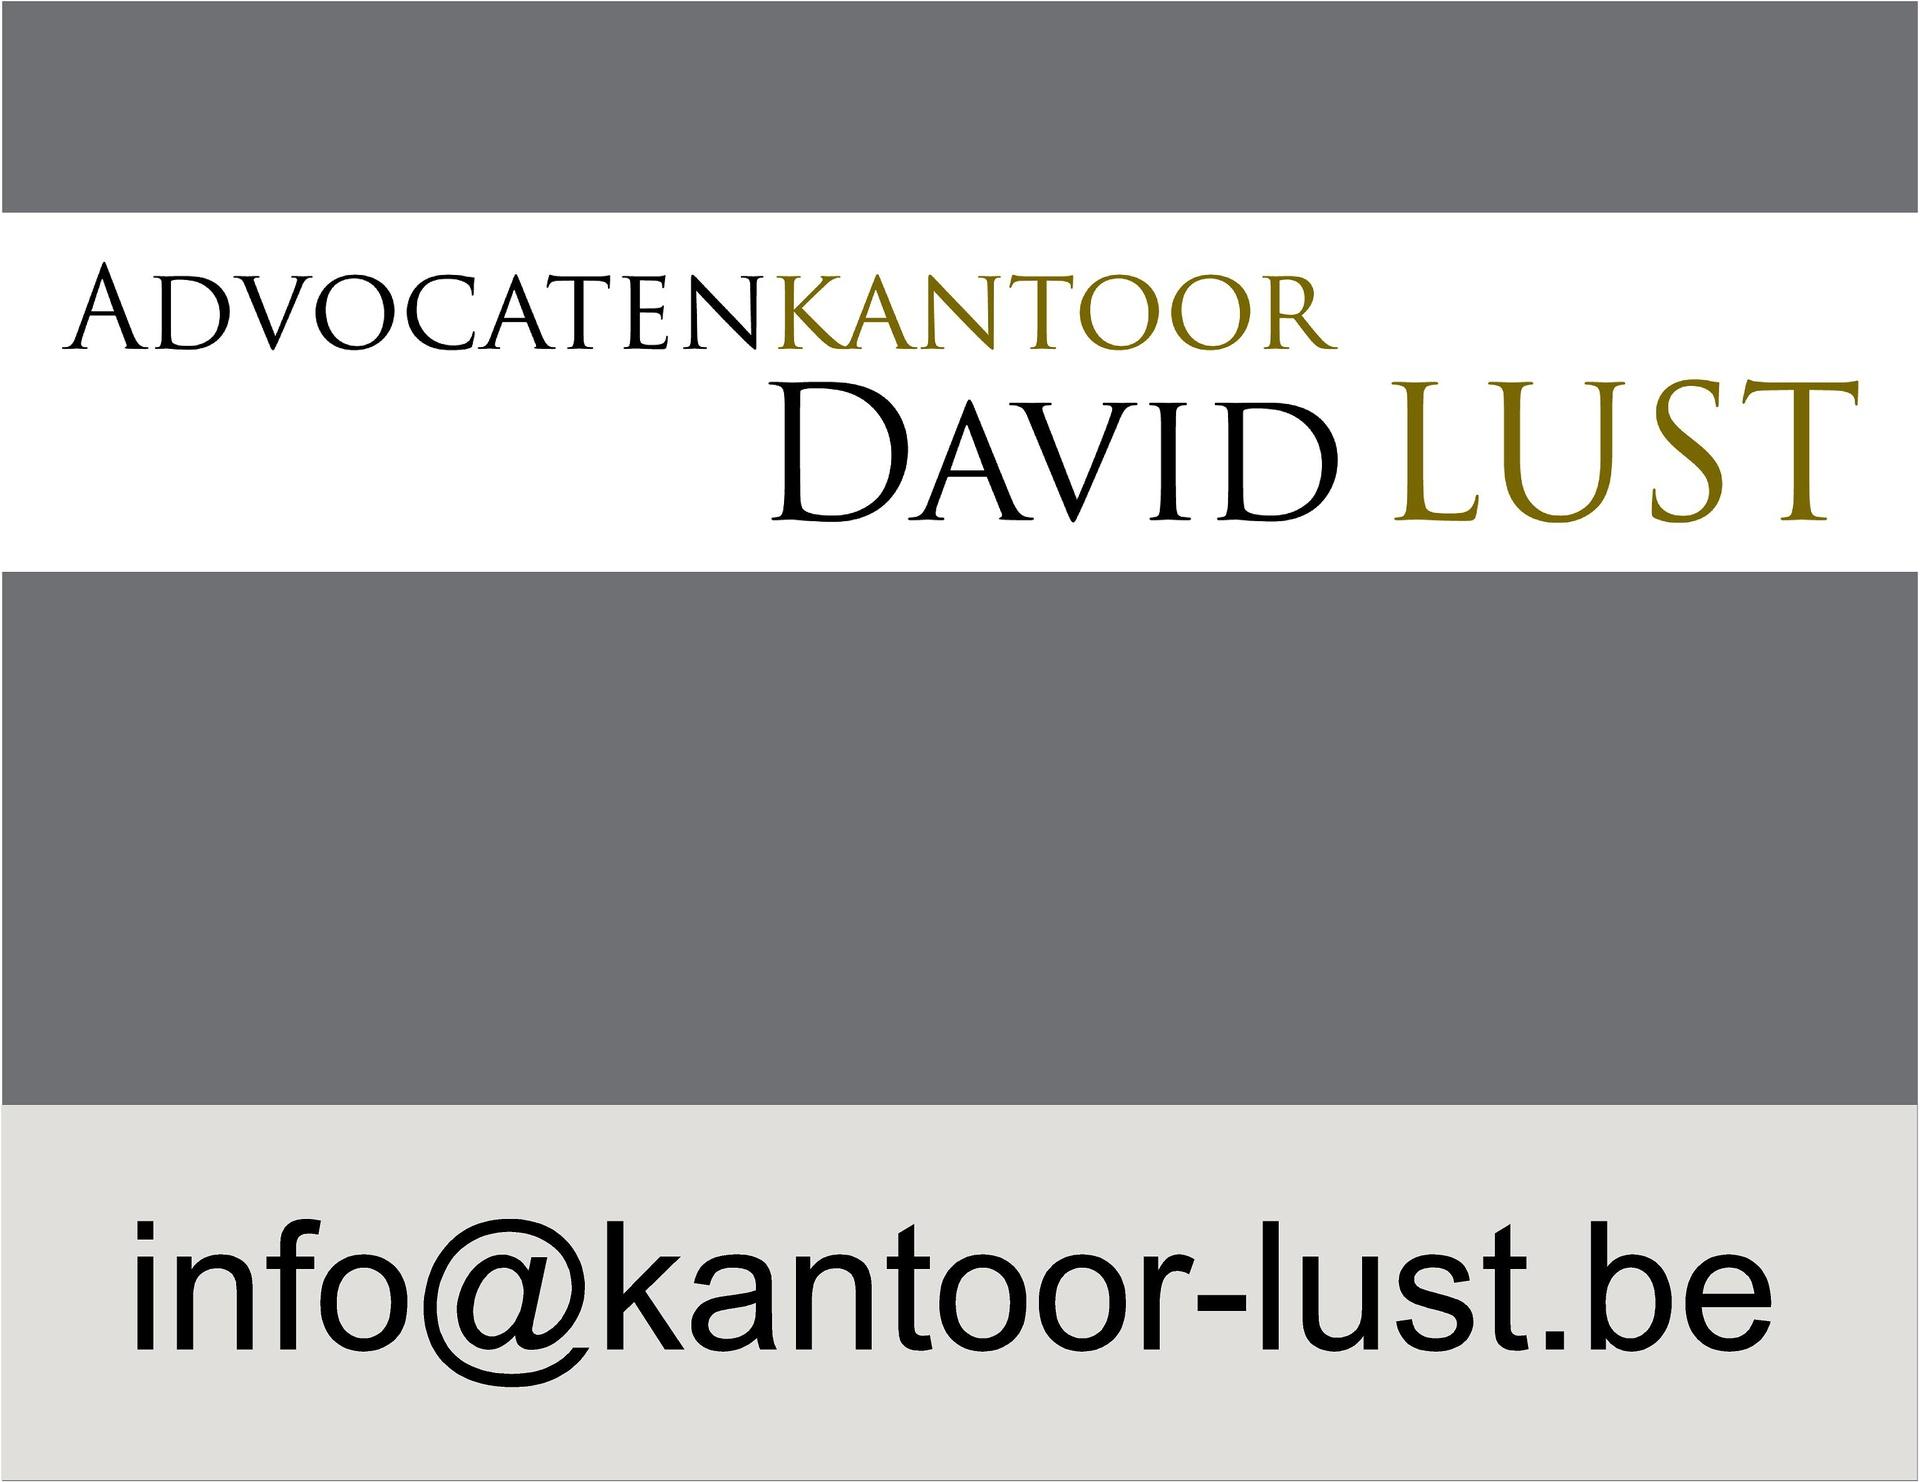 David Lust